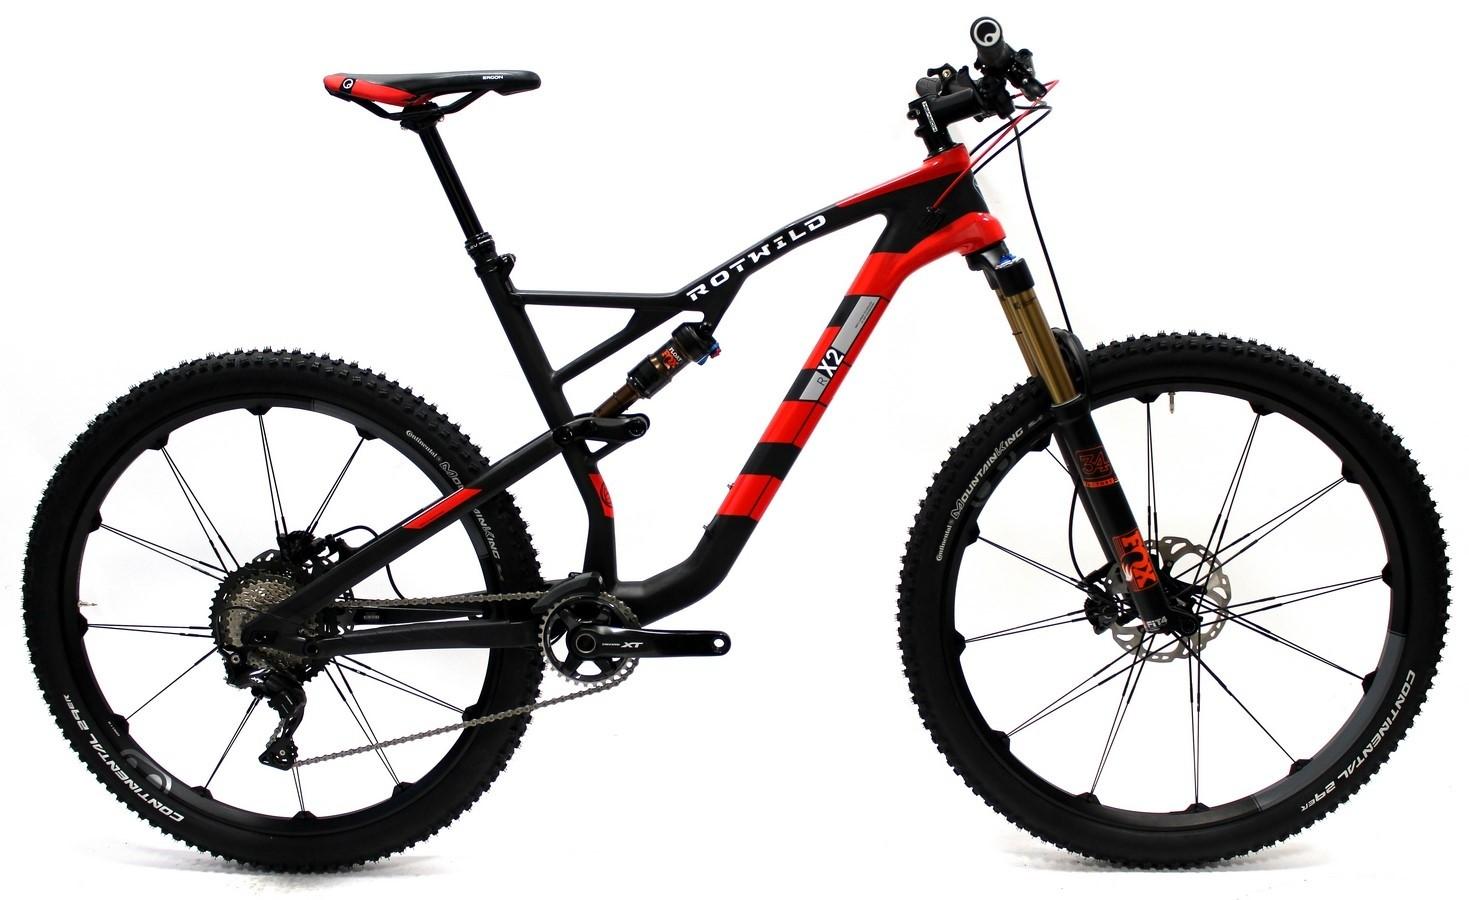 X2 FS 29 Edition